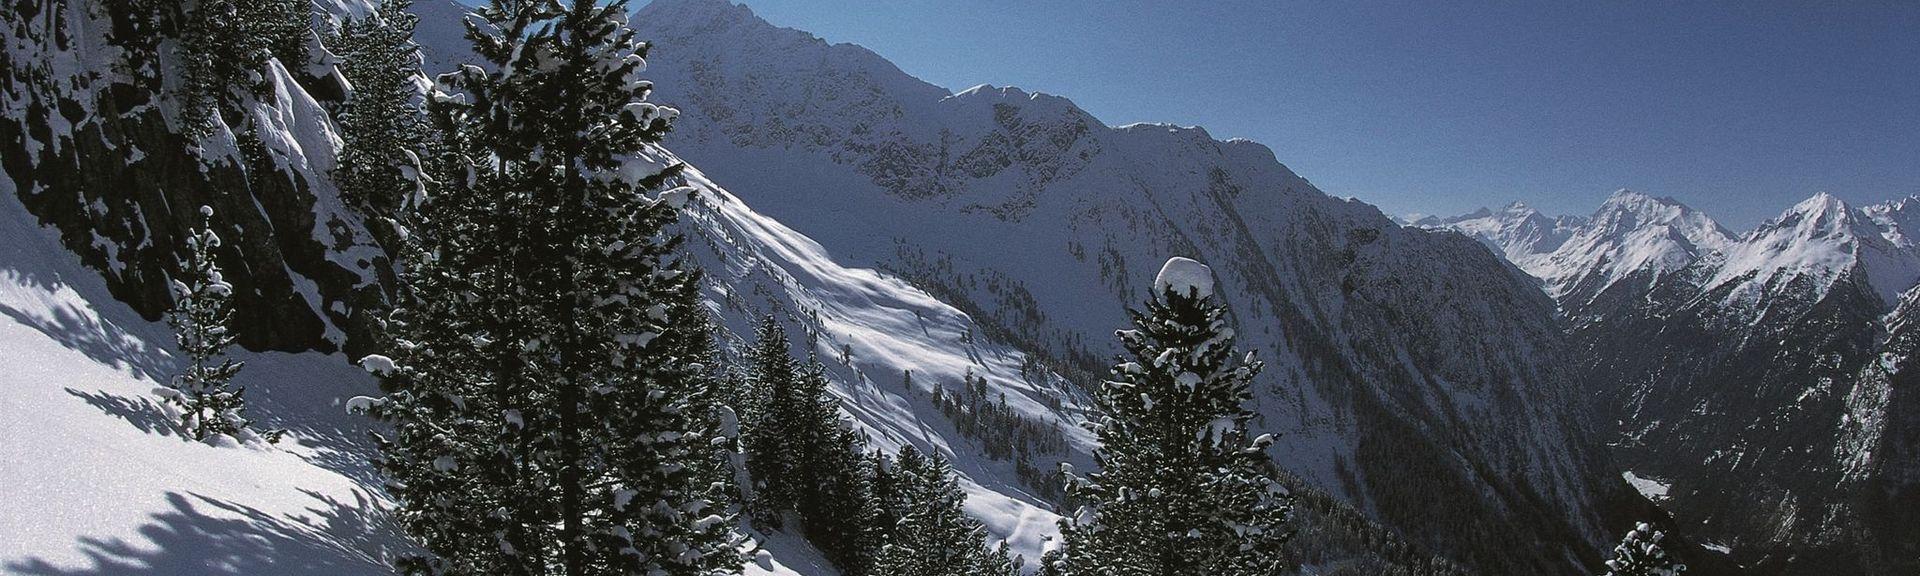 Cascate di Krimmler, Krimml, Salisburgo, Austria